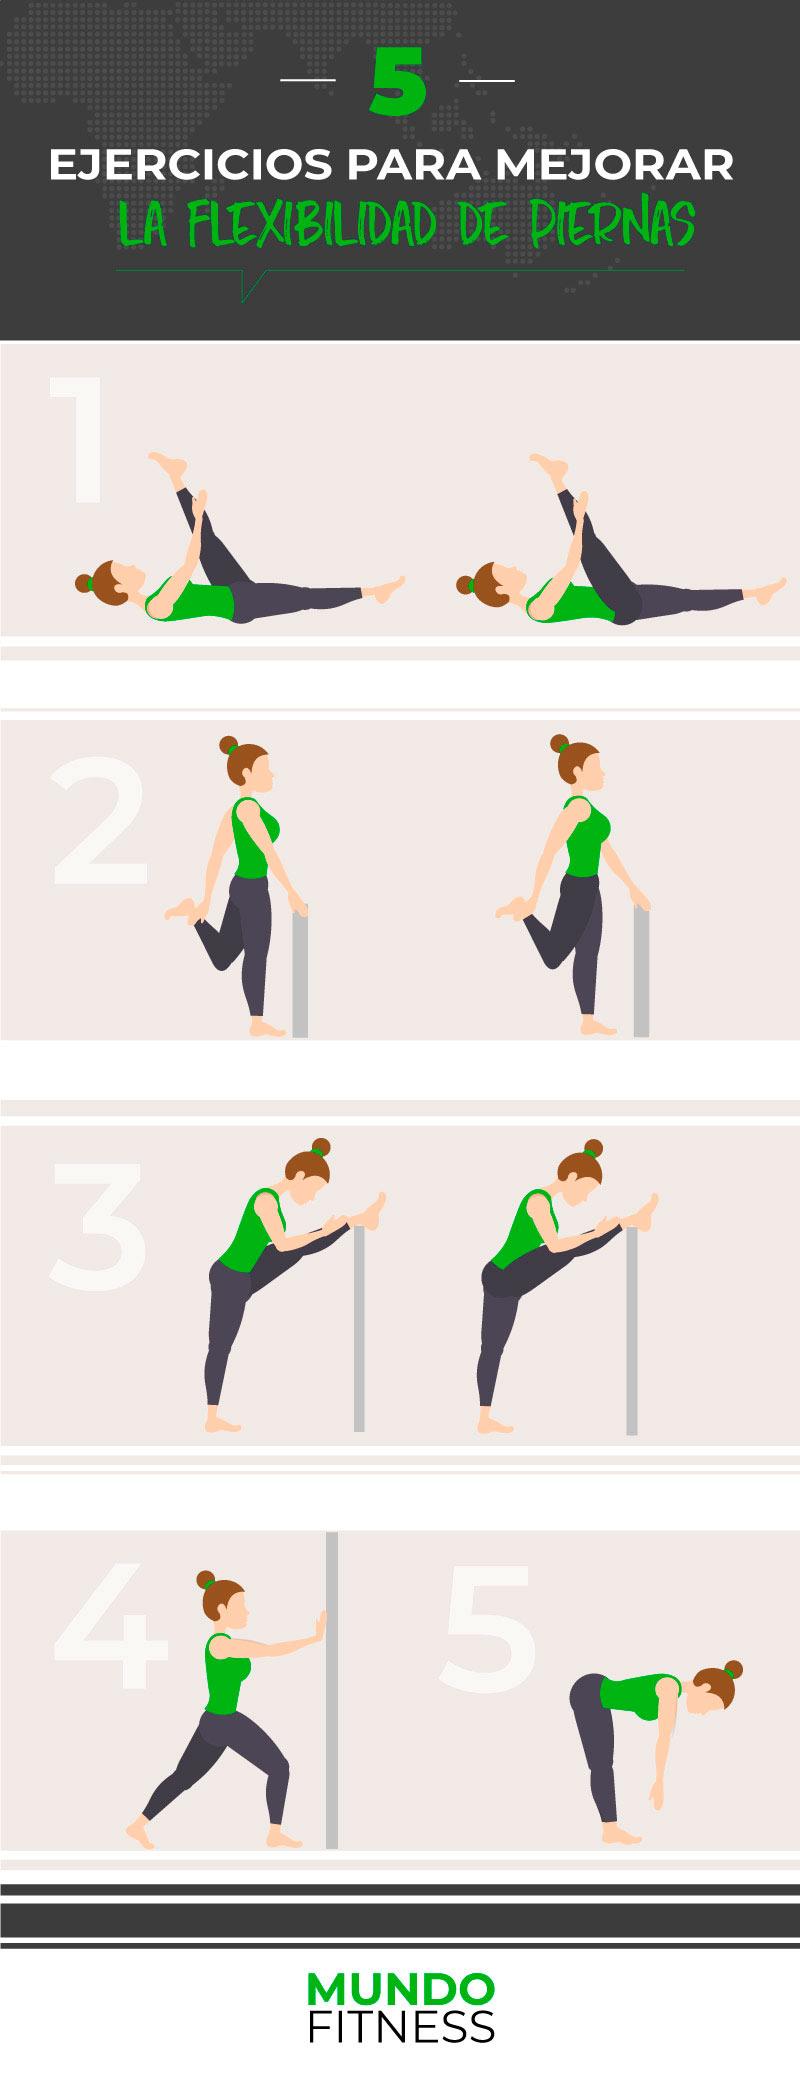 ejercicios-flexibilidad-piernas-infografia